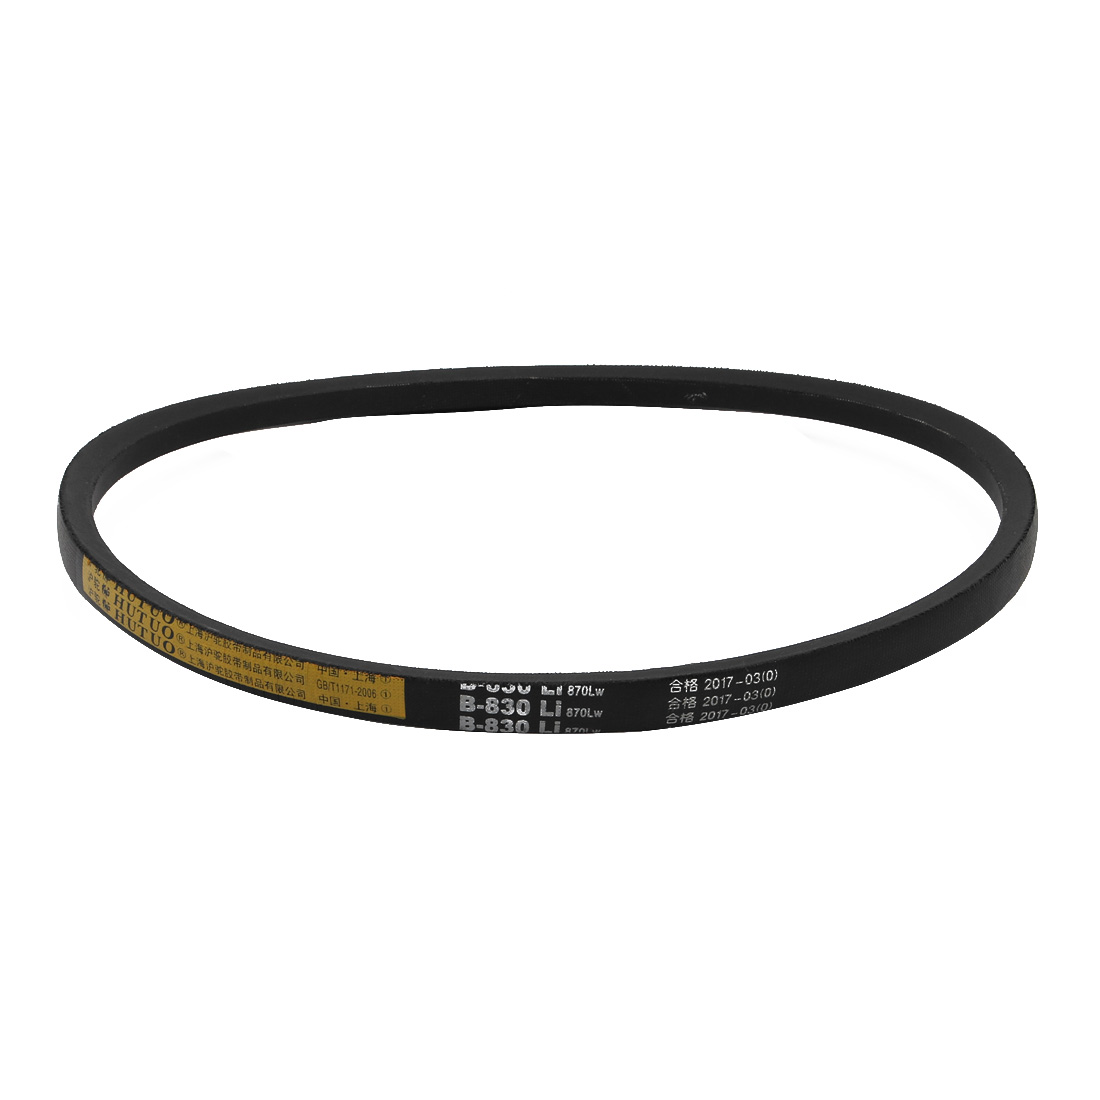 Unique Bargains B830 17mm Width 11mm Thickness Rubber Transmission Drive V-Belt - image 2 de 3